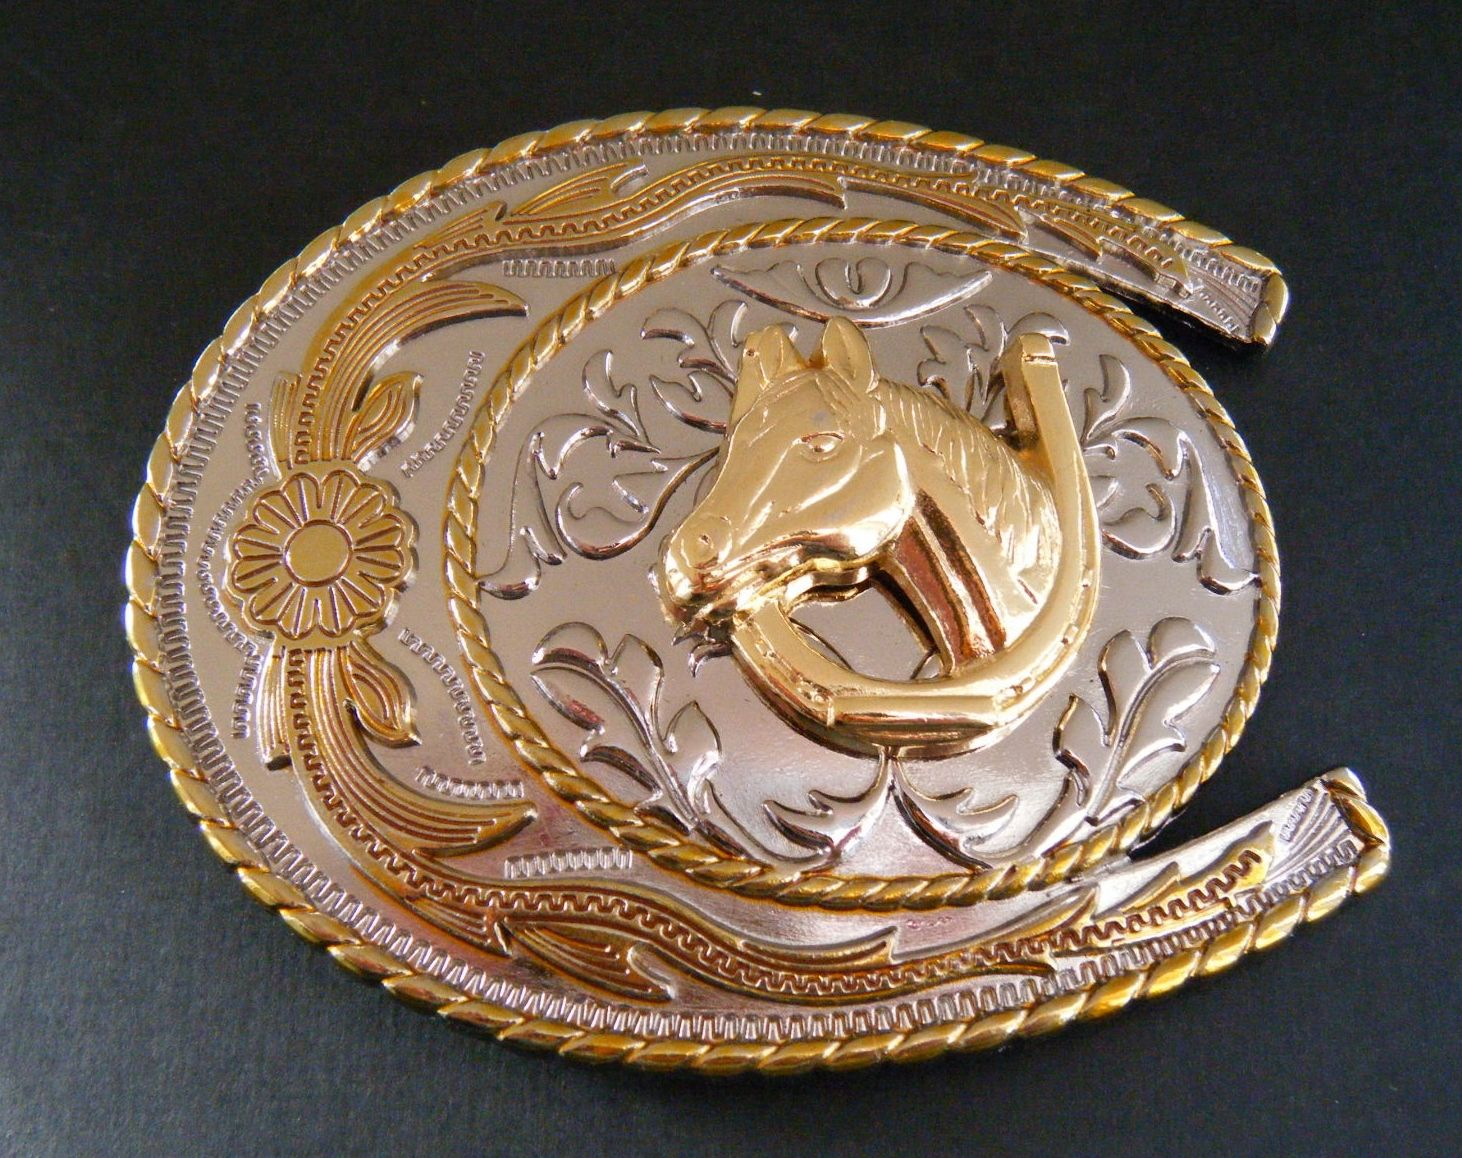 New Western Belt Buckle Western Cowboy HORSE SHOE Rodeo